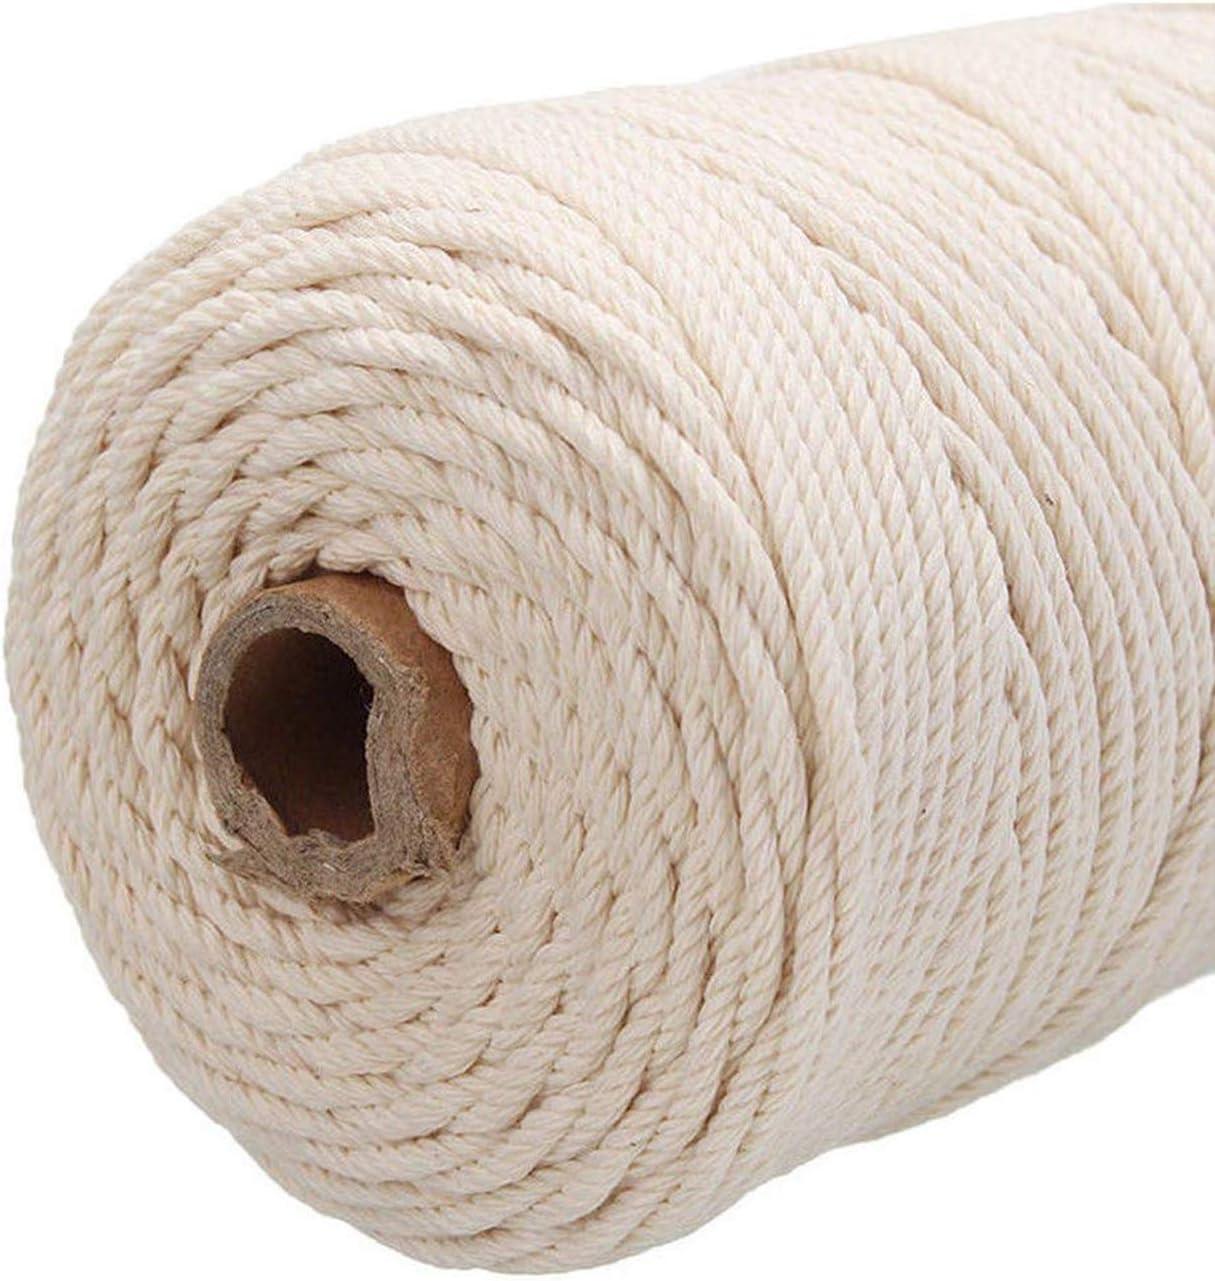 3mm x 100m Natural Handmade Cotton Cord Yarn Rope DIY Craft Knitting Wall Hanging Plant Hanger Ouinne Macrame Cotton Cord